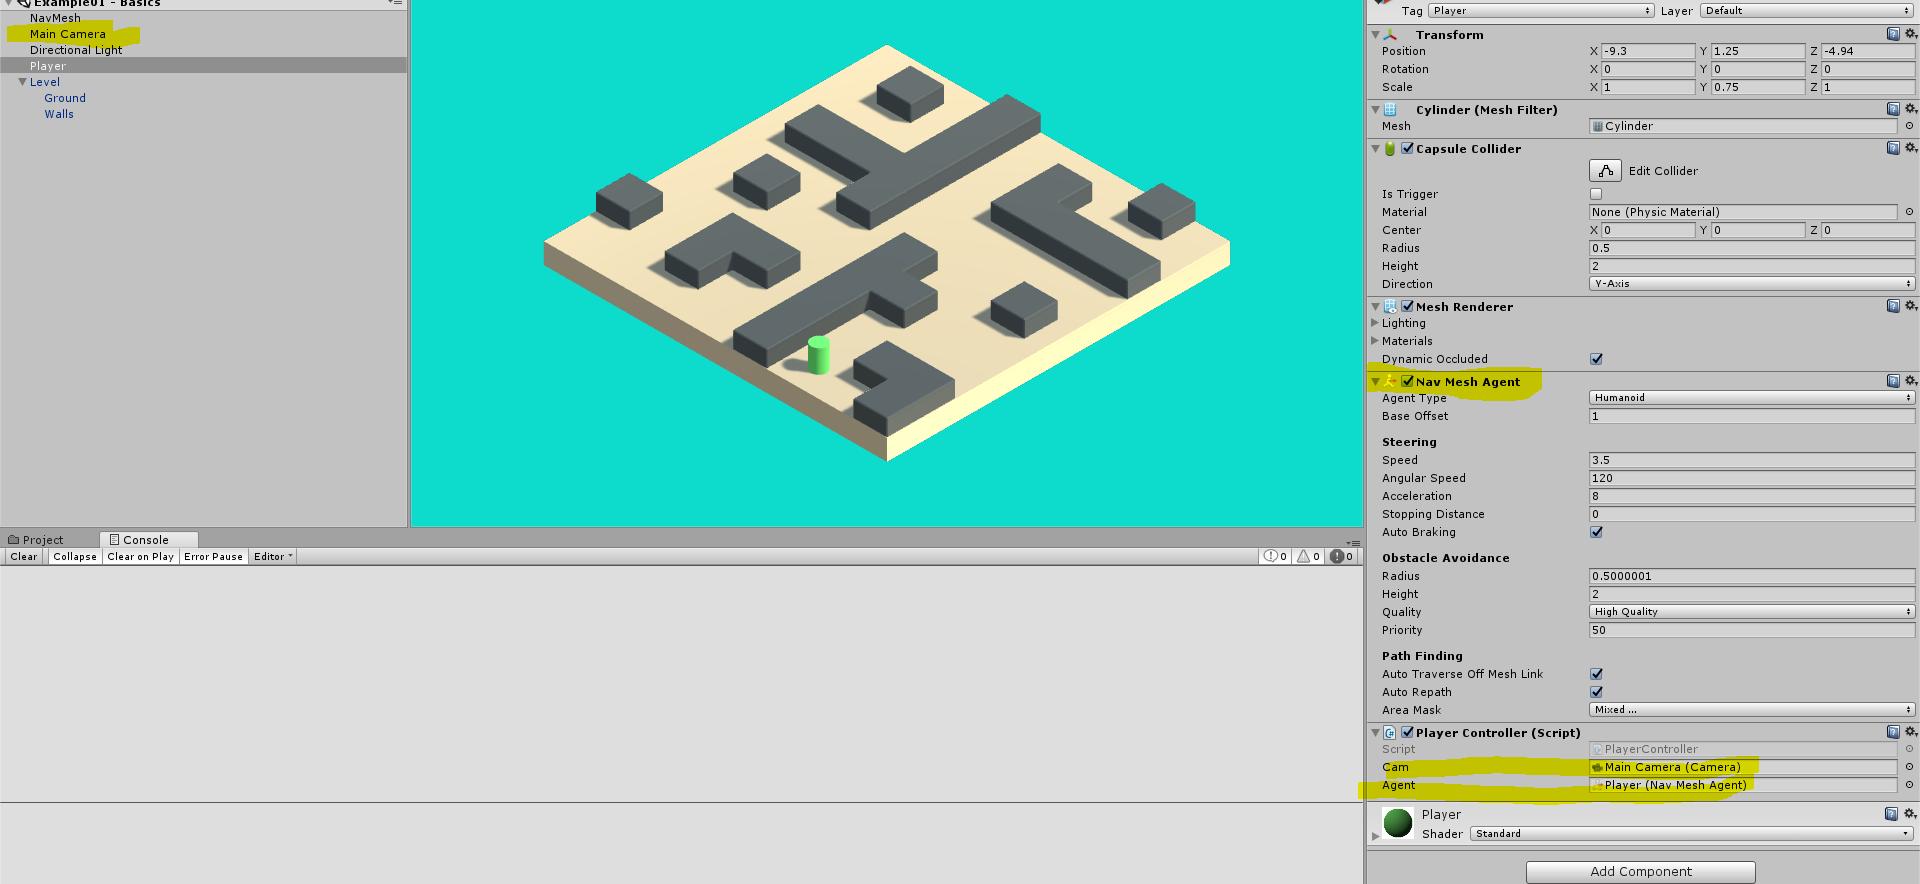 Raycast navigation not working? - Unity Forum